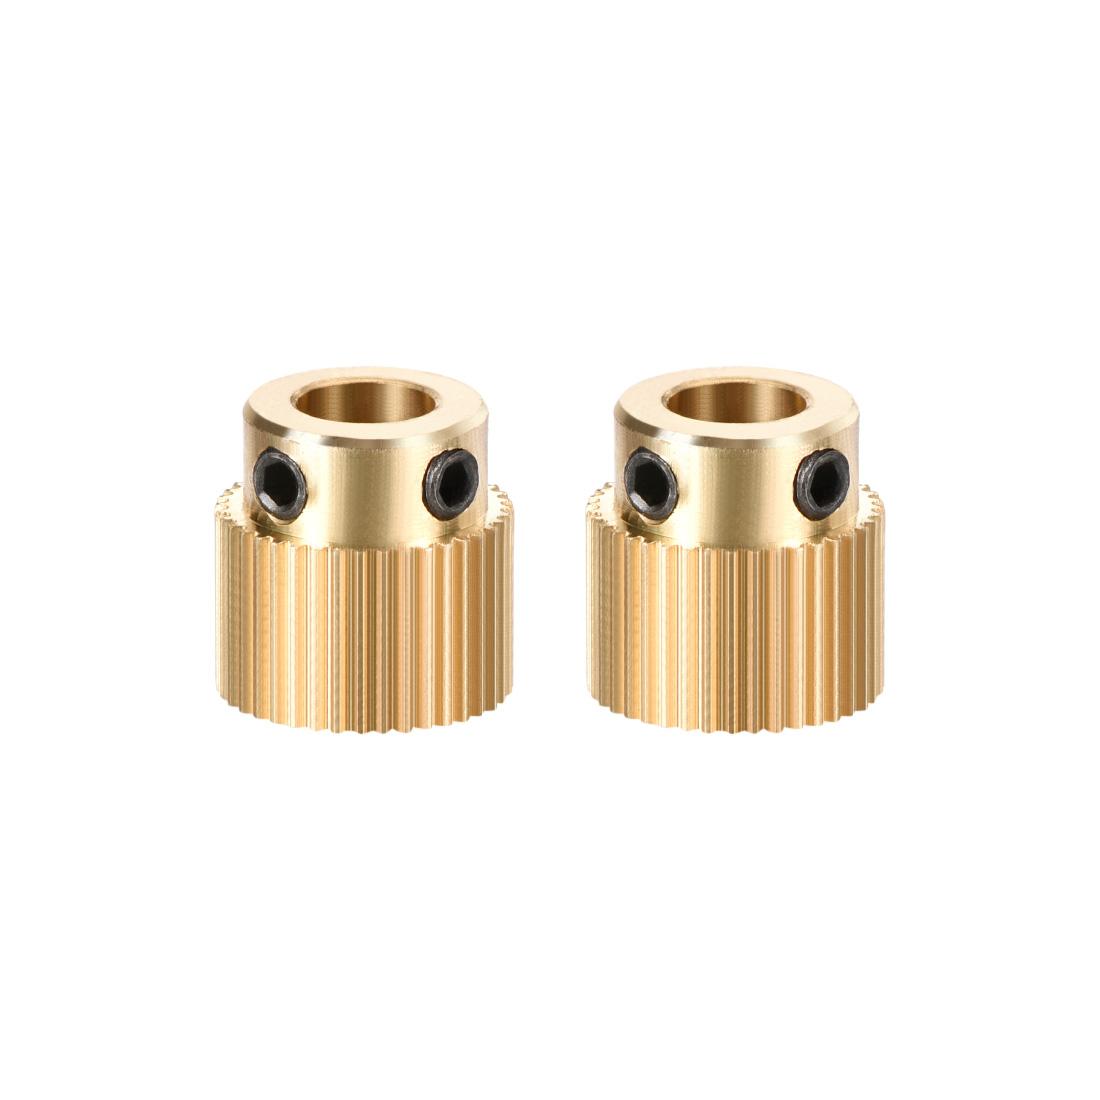 Brass Drive Gear Extruder Wheel 40 Teeth 5mm Bore 2pcs